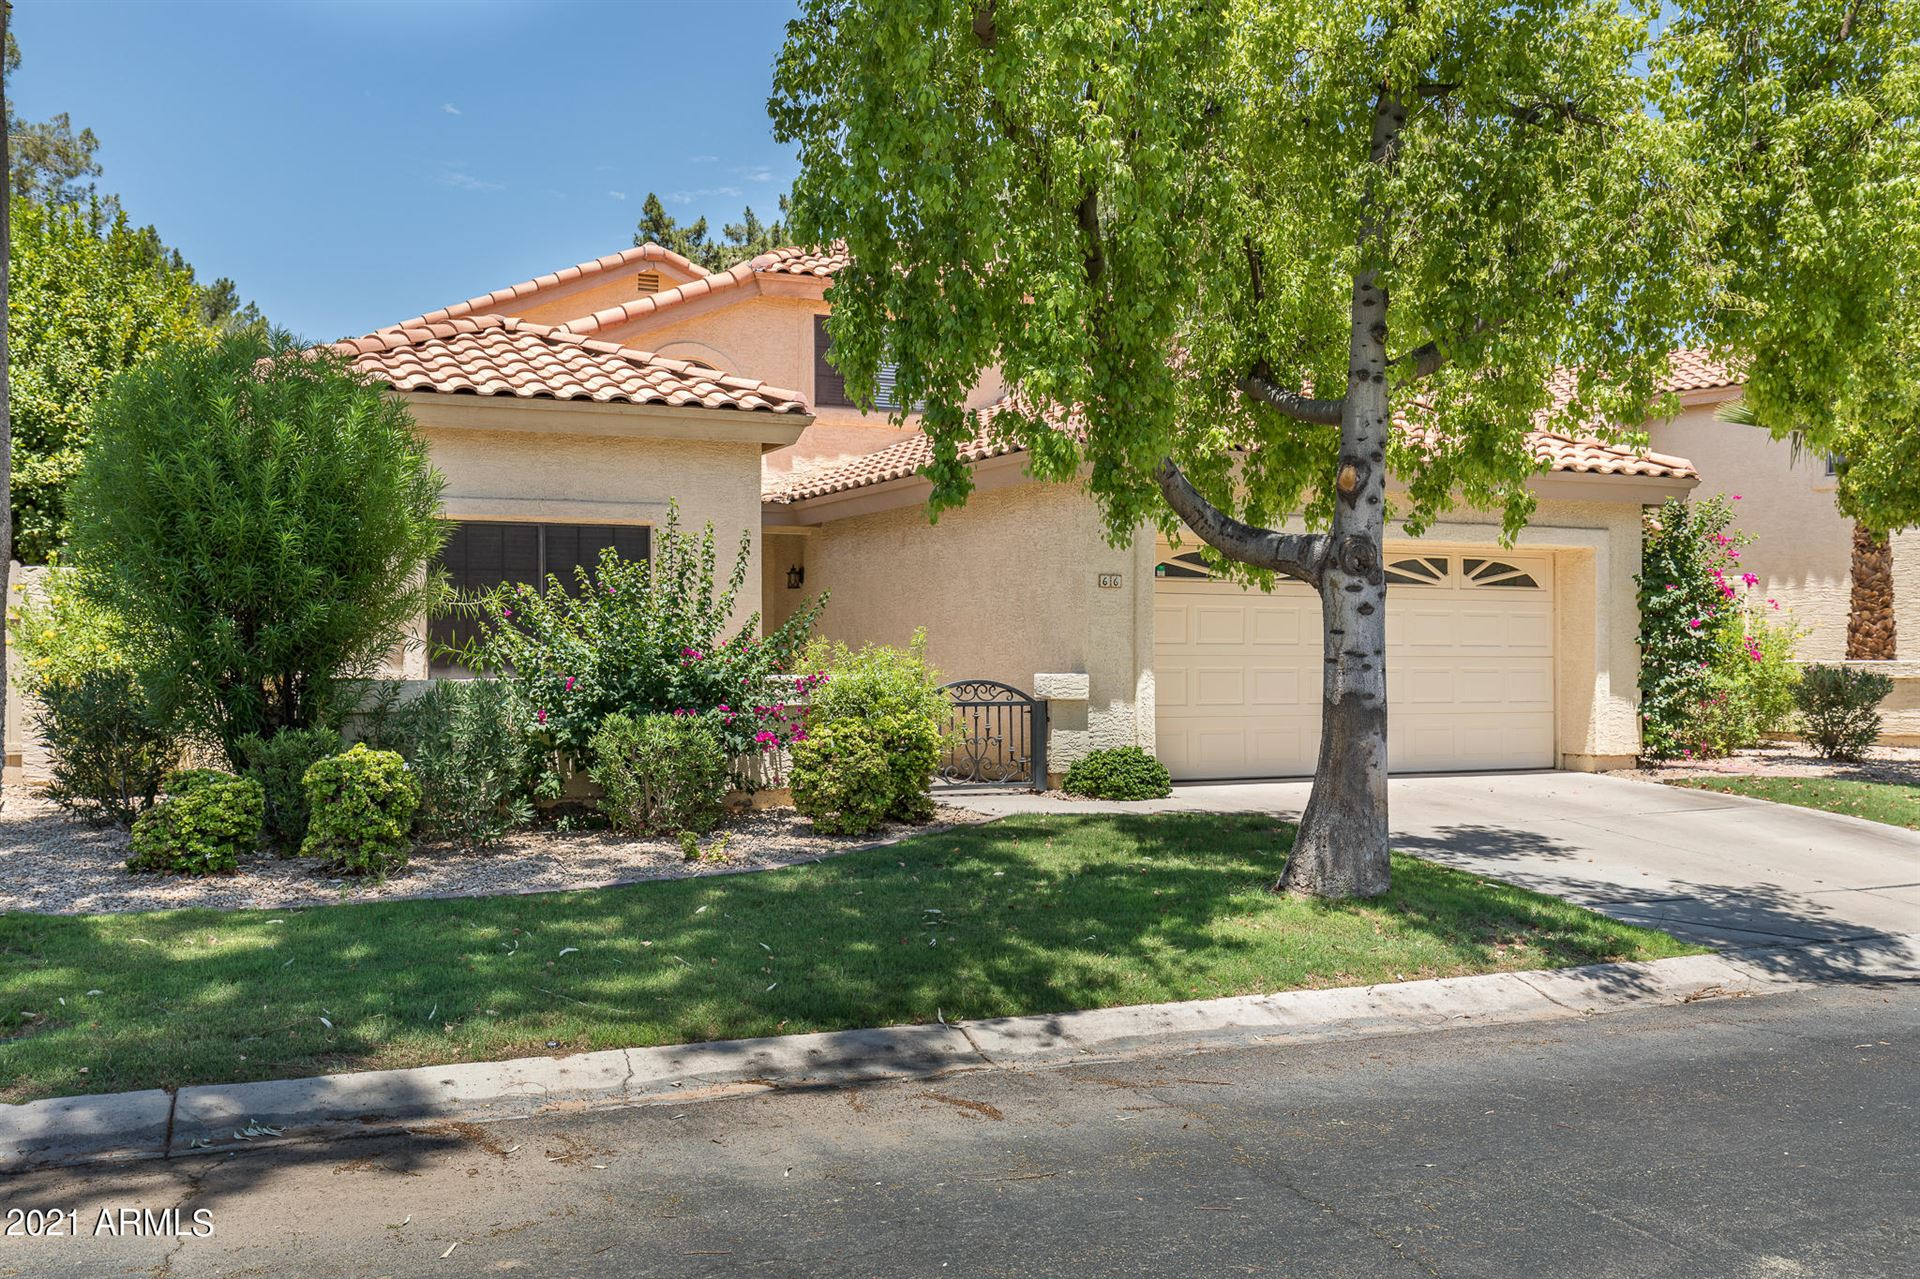 Photo of 66 E RANCH Road, Tempe, AZ 85284 (MLS # 6266862)